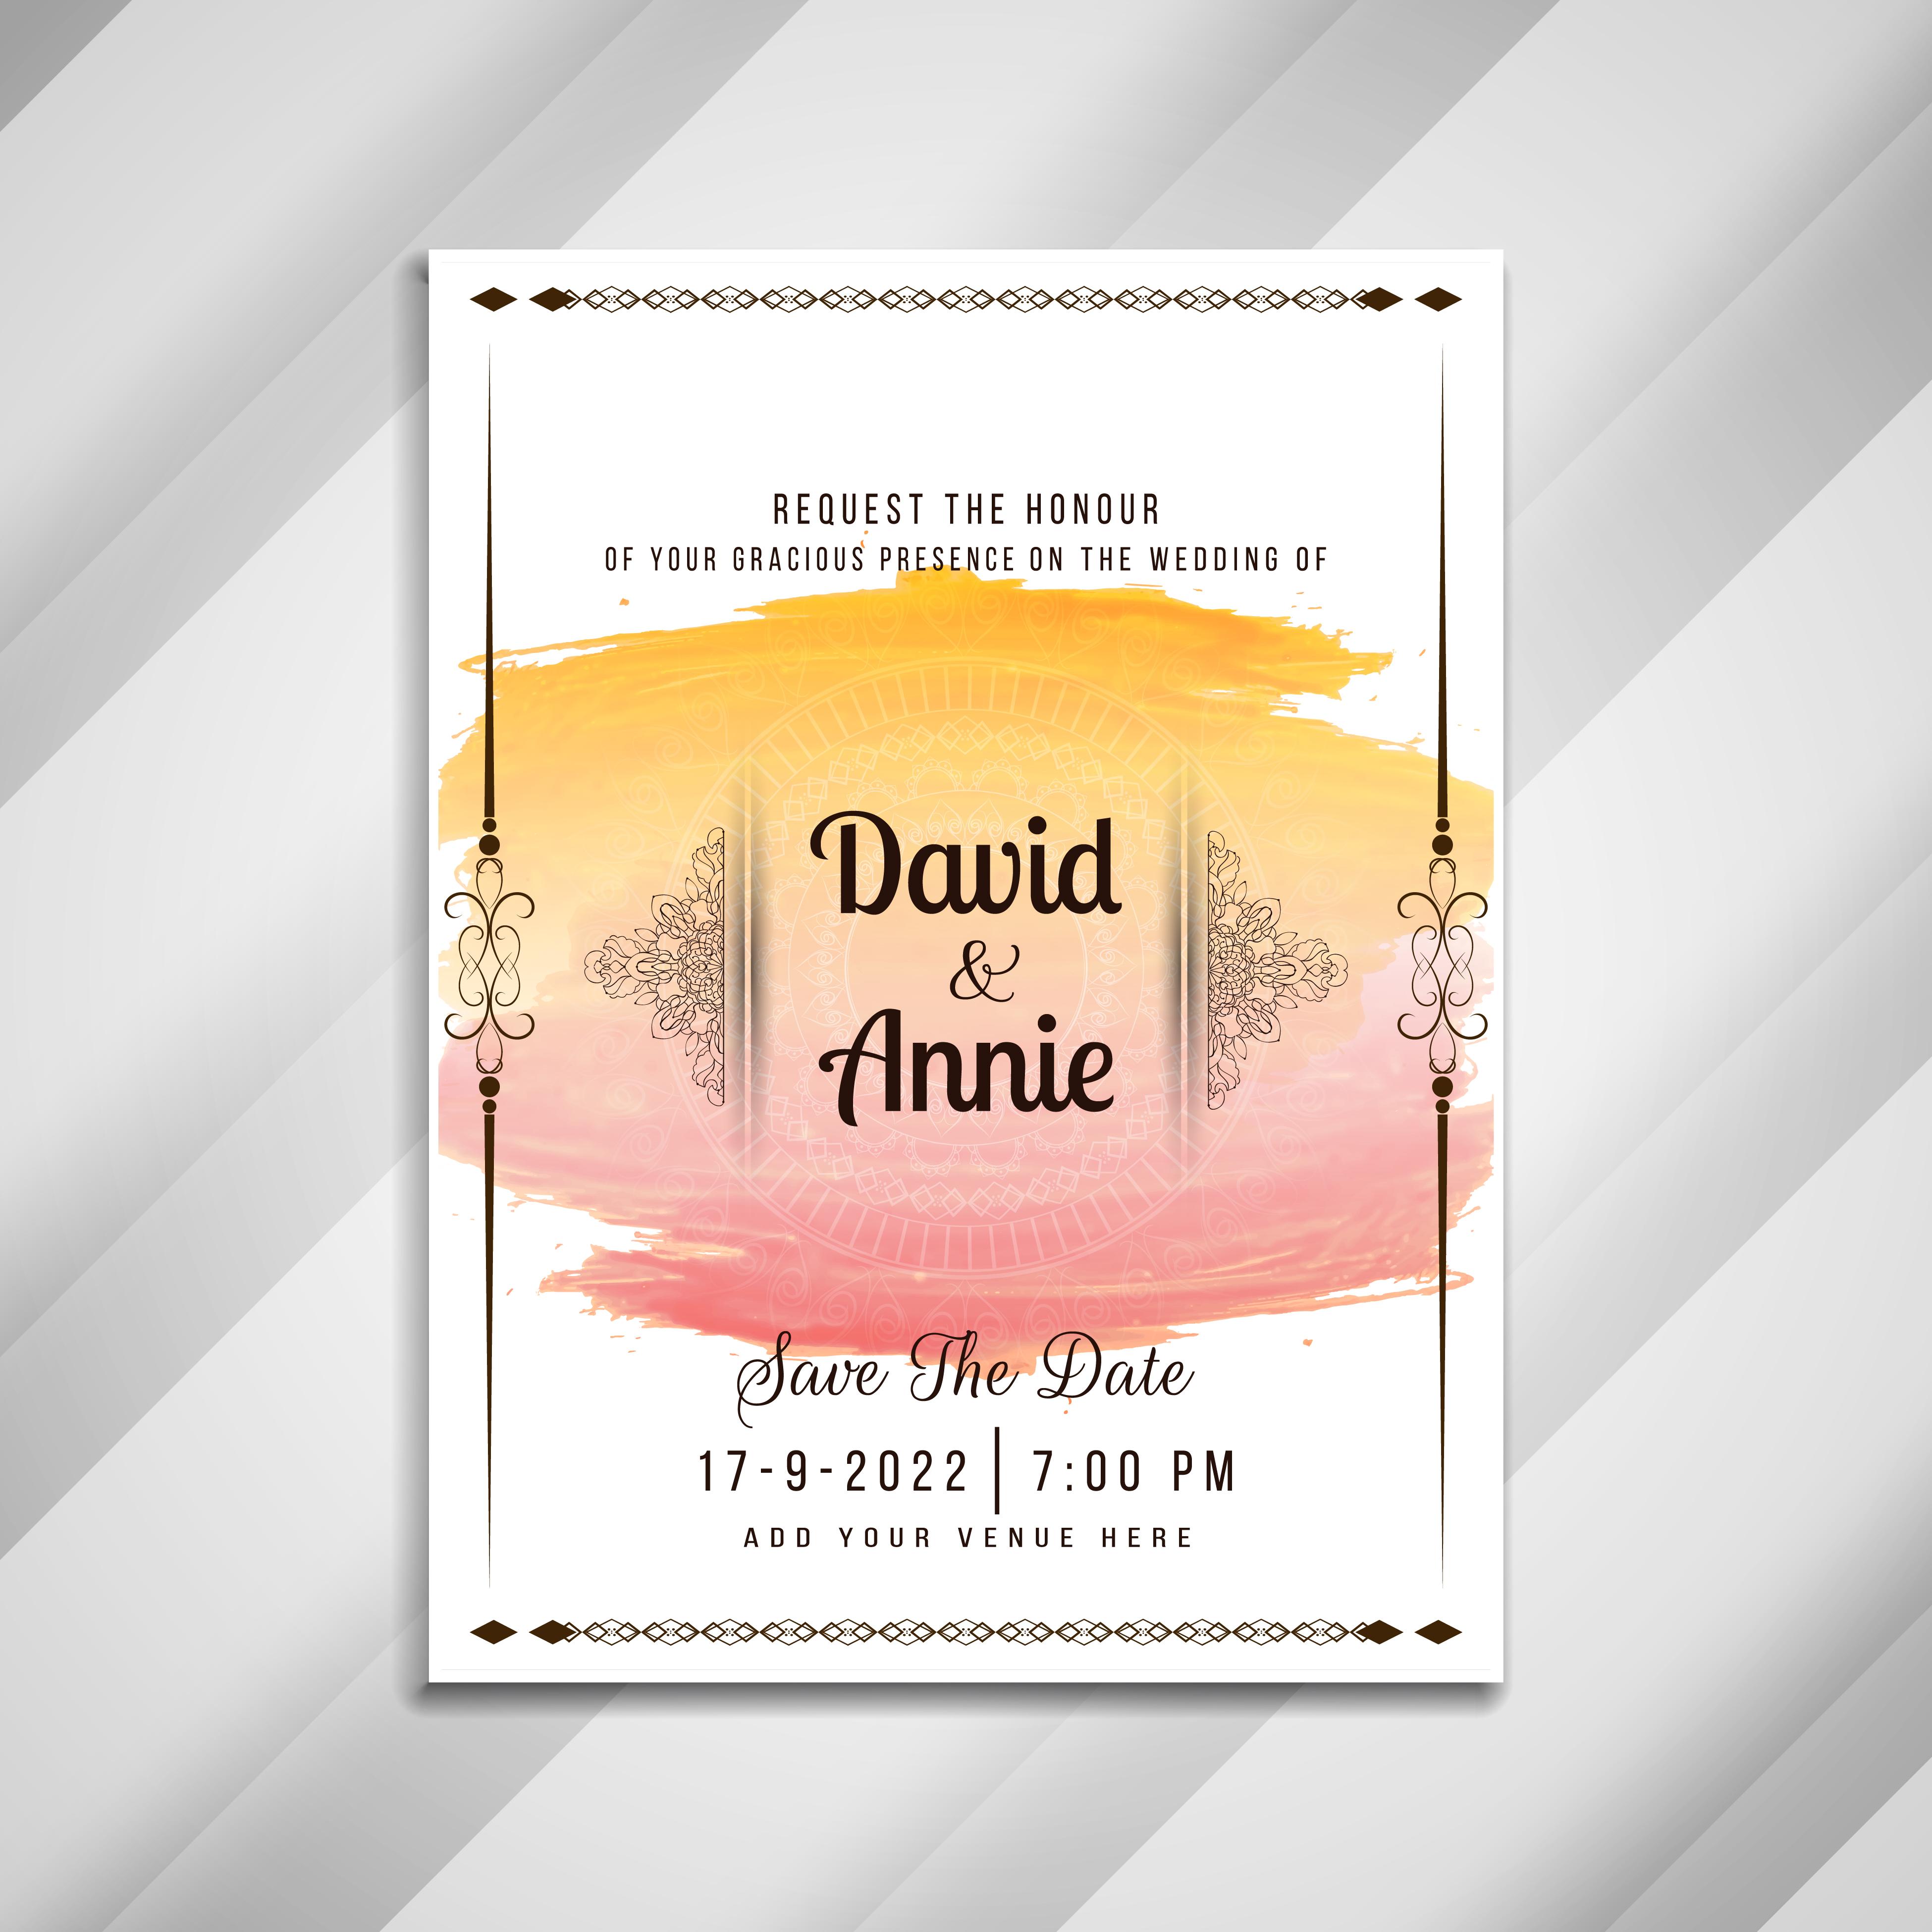 abstract beautiful wedding invitation card design 254656